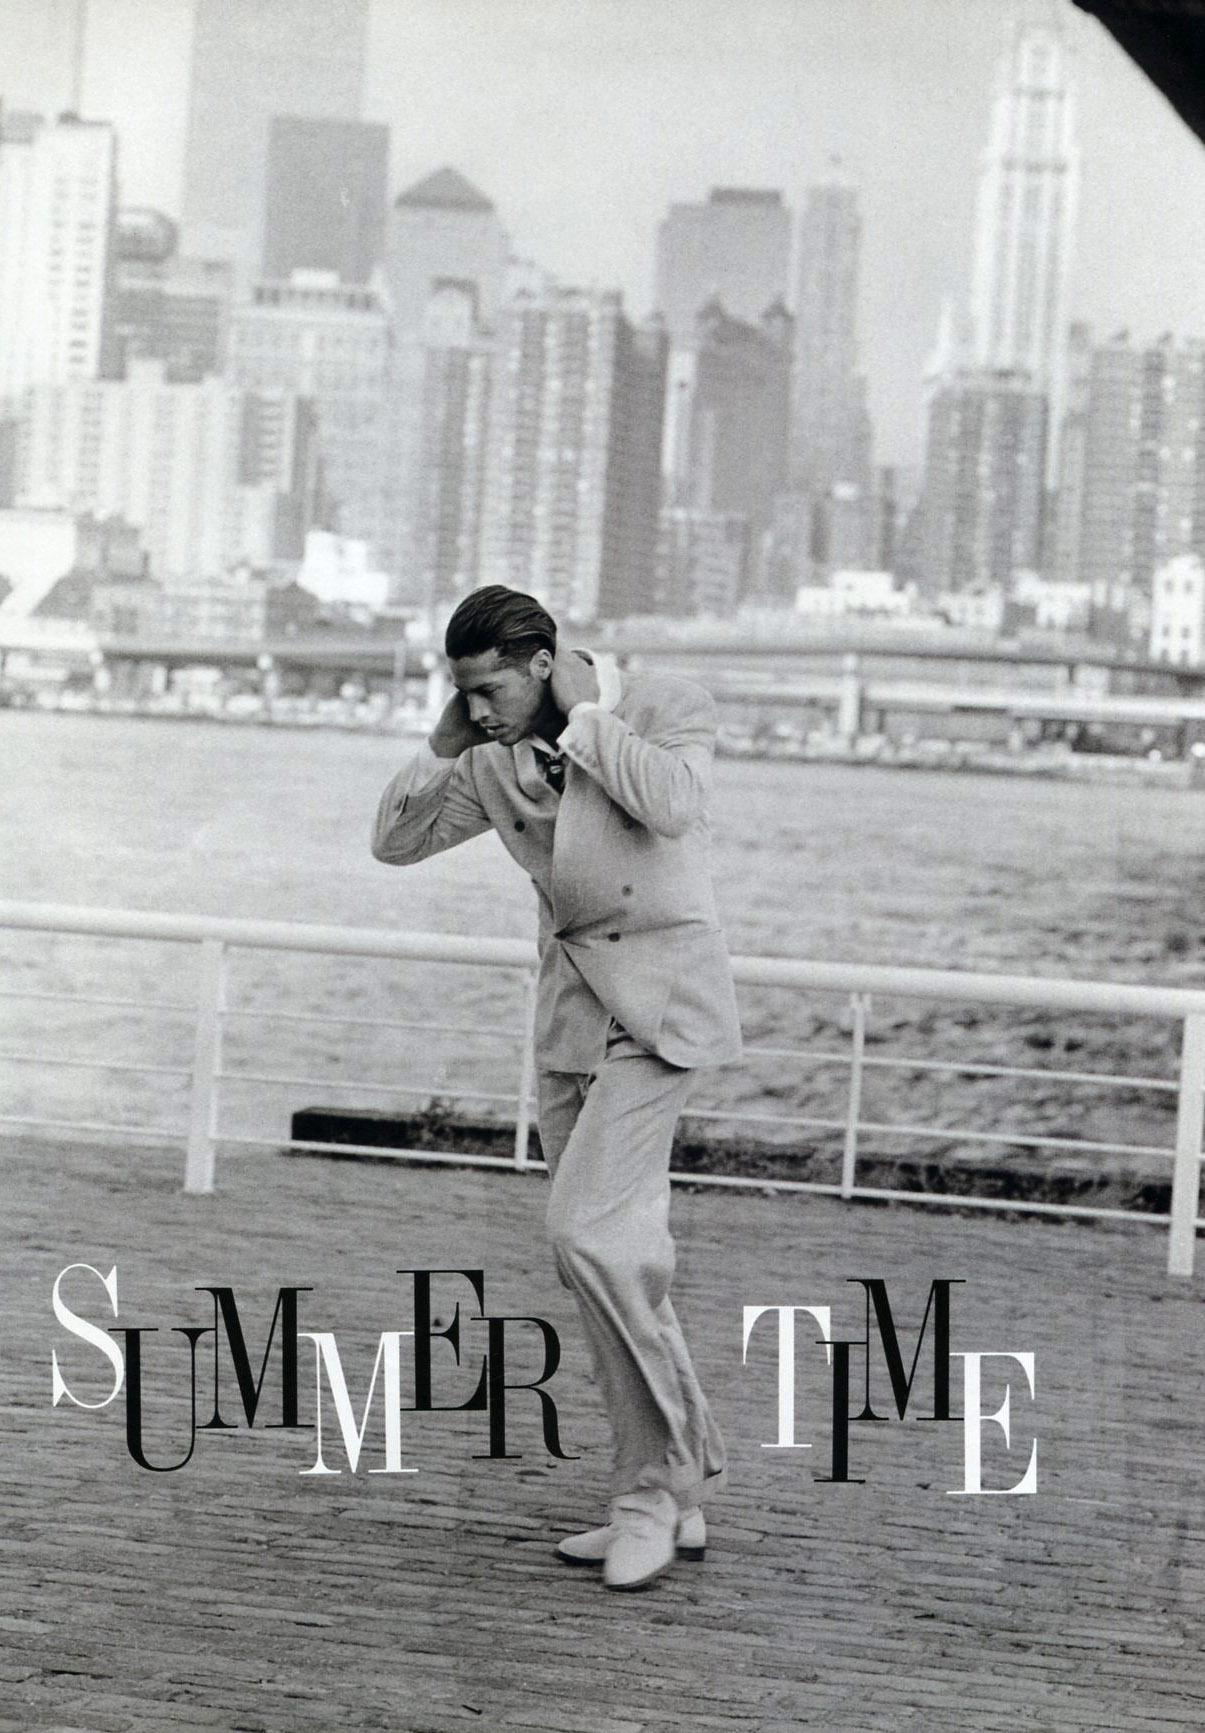 55063_Bryan_Randall_90s_Vogue_Hommes_International_-_Summertime_002_122_2lo.jpg